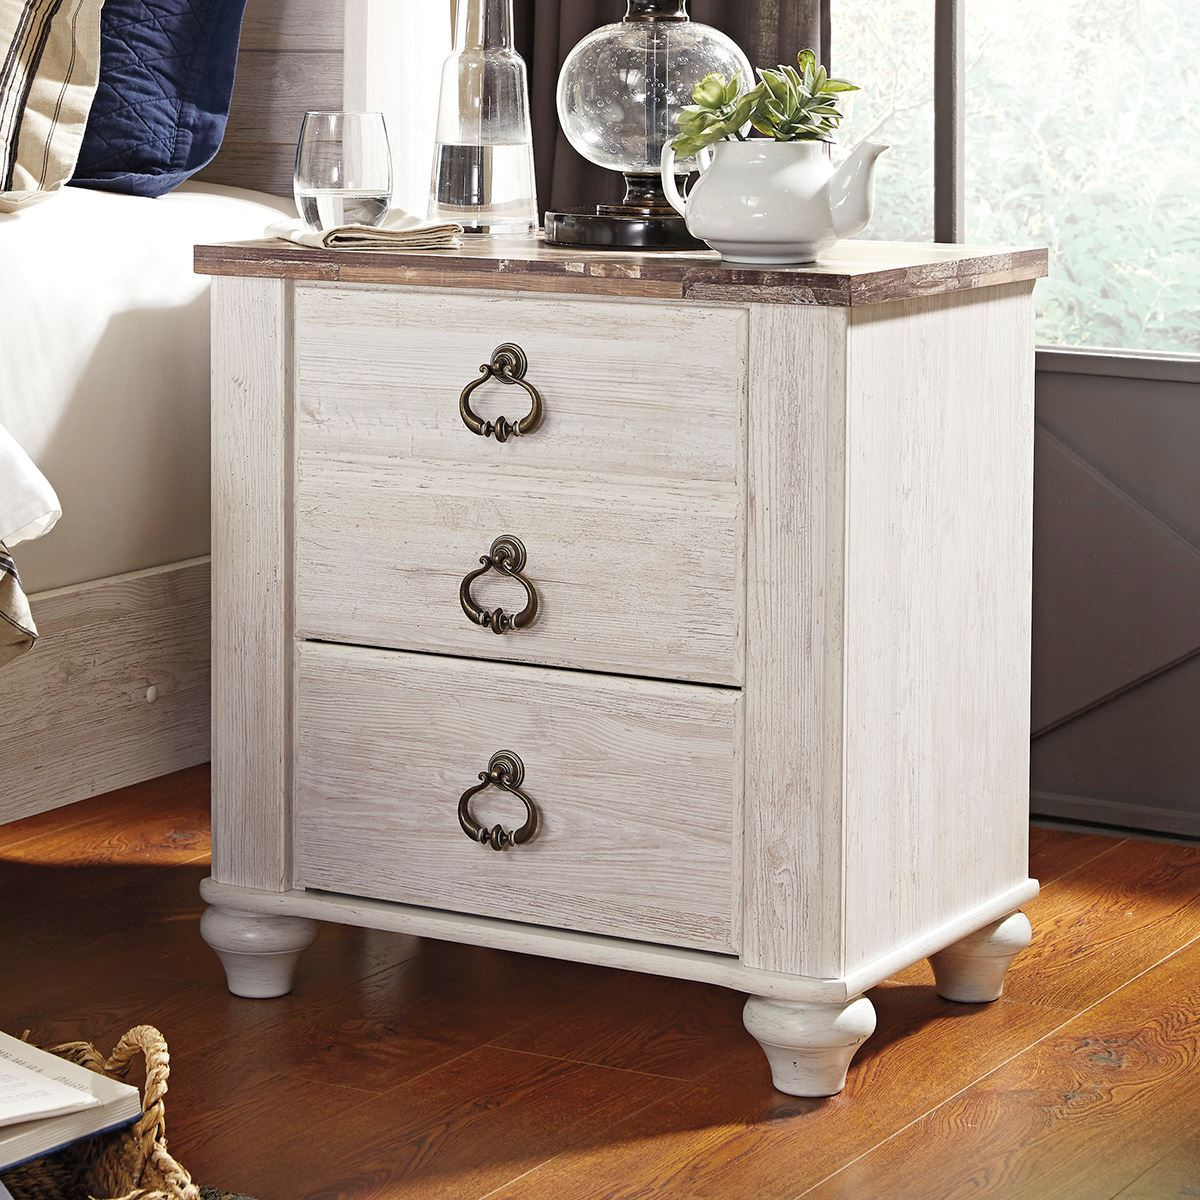 wildflower 2 drawer nightstand | bedroom night stands | lifestyle furniturebabette's